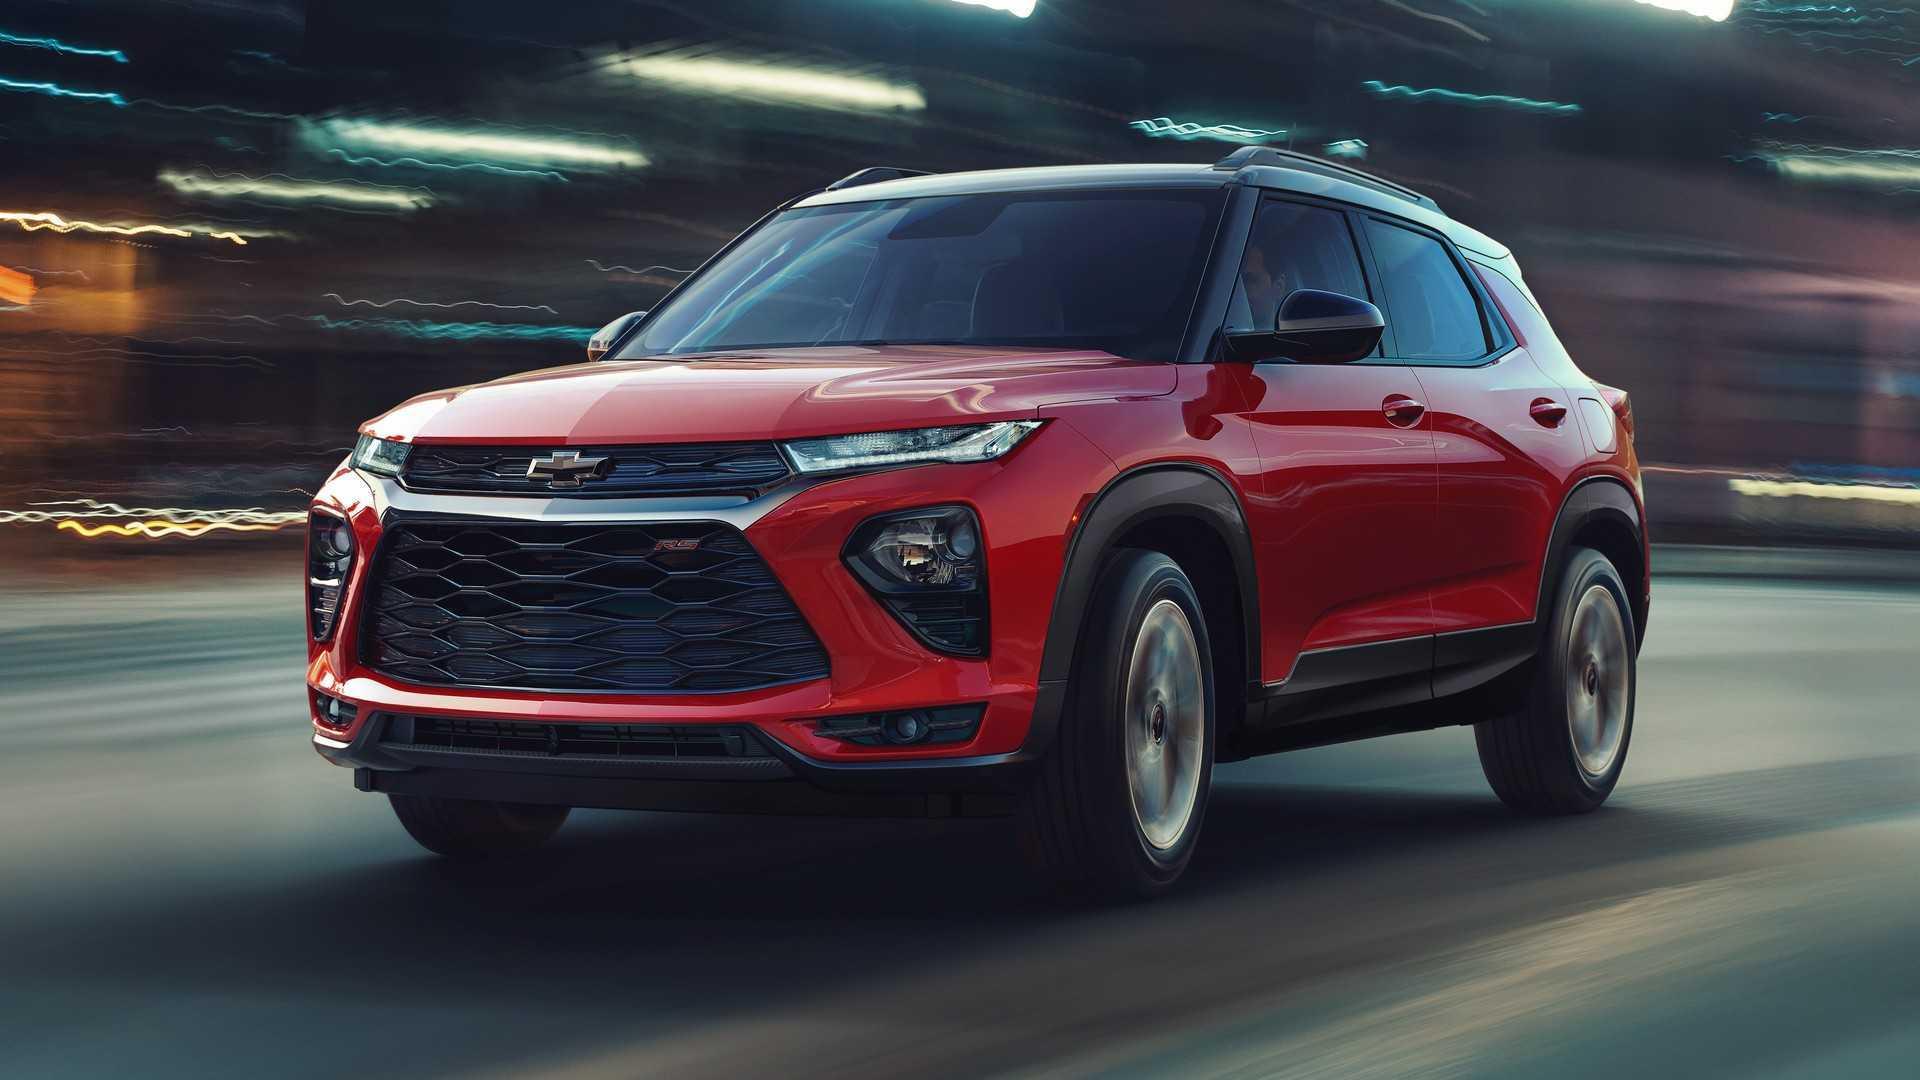 2021 Chevrolet Trailblazer Debuts As GM's Newest Compact SUV